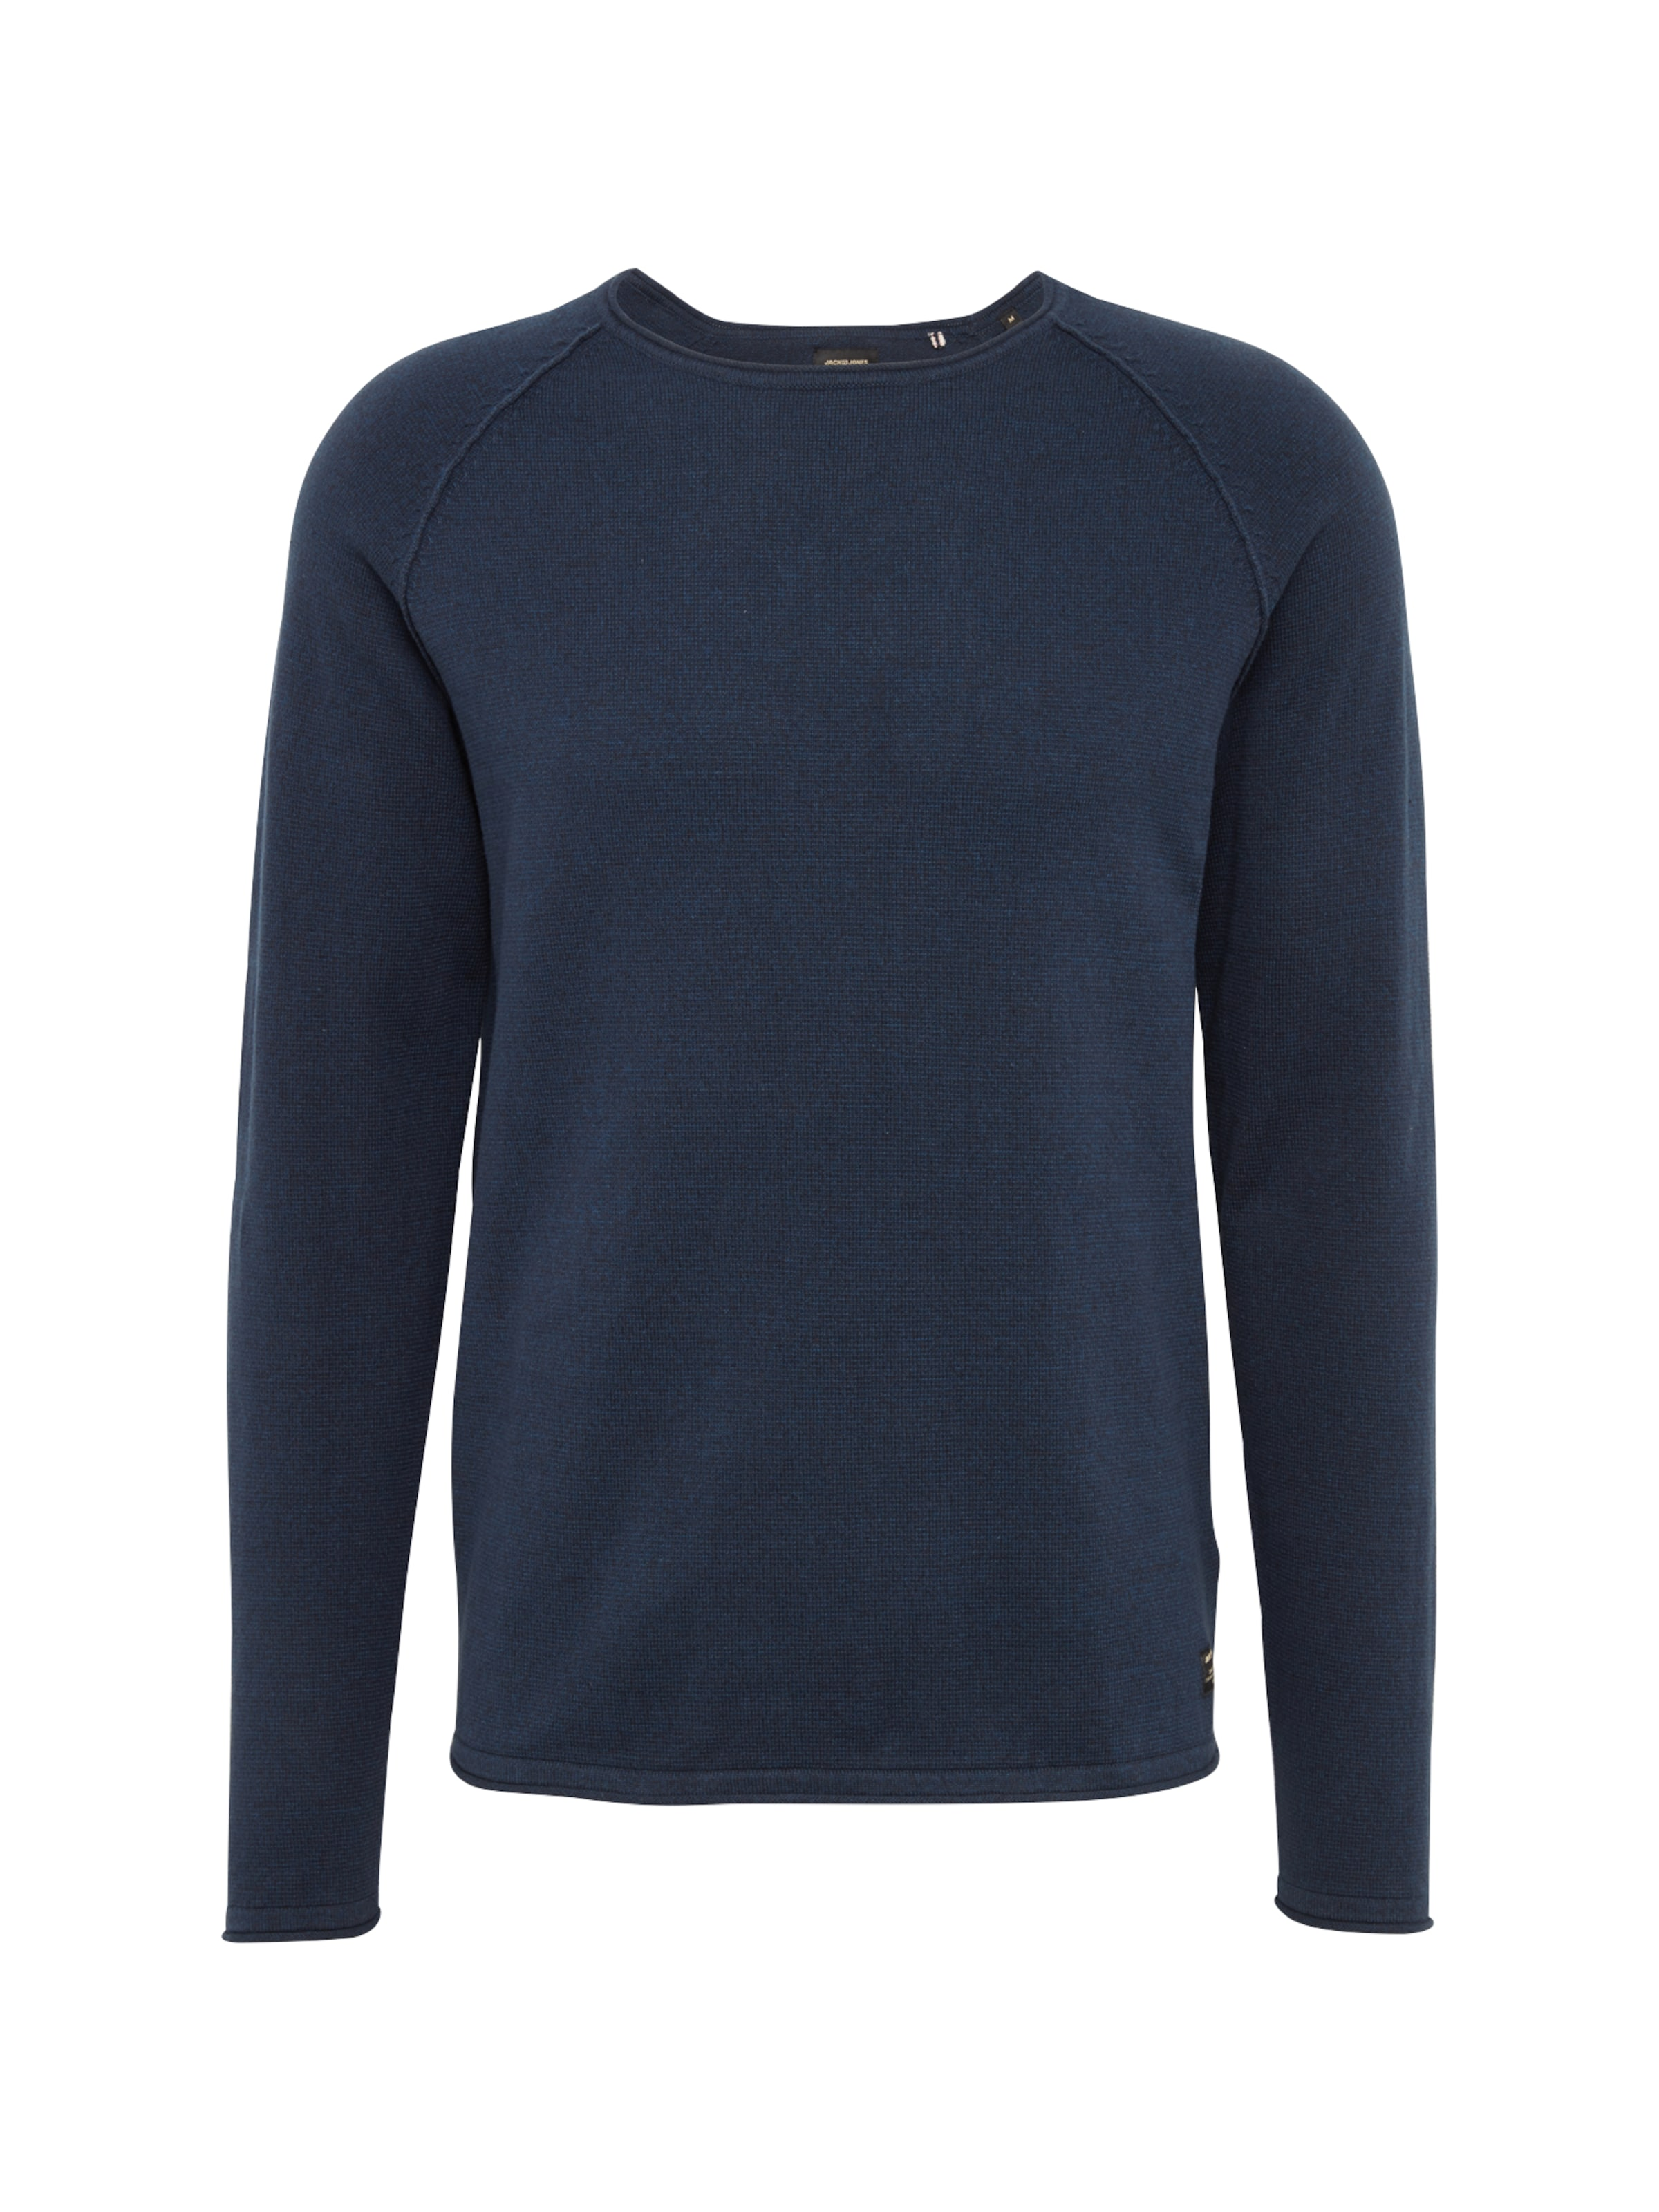 Jackamp; Jones Blau Pullover In 'eunion' VpUzSM